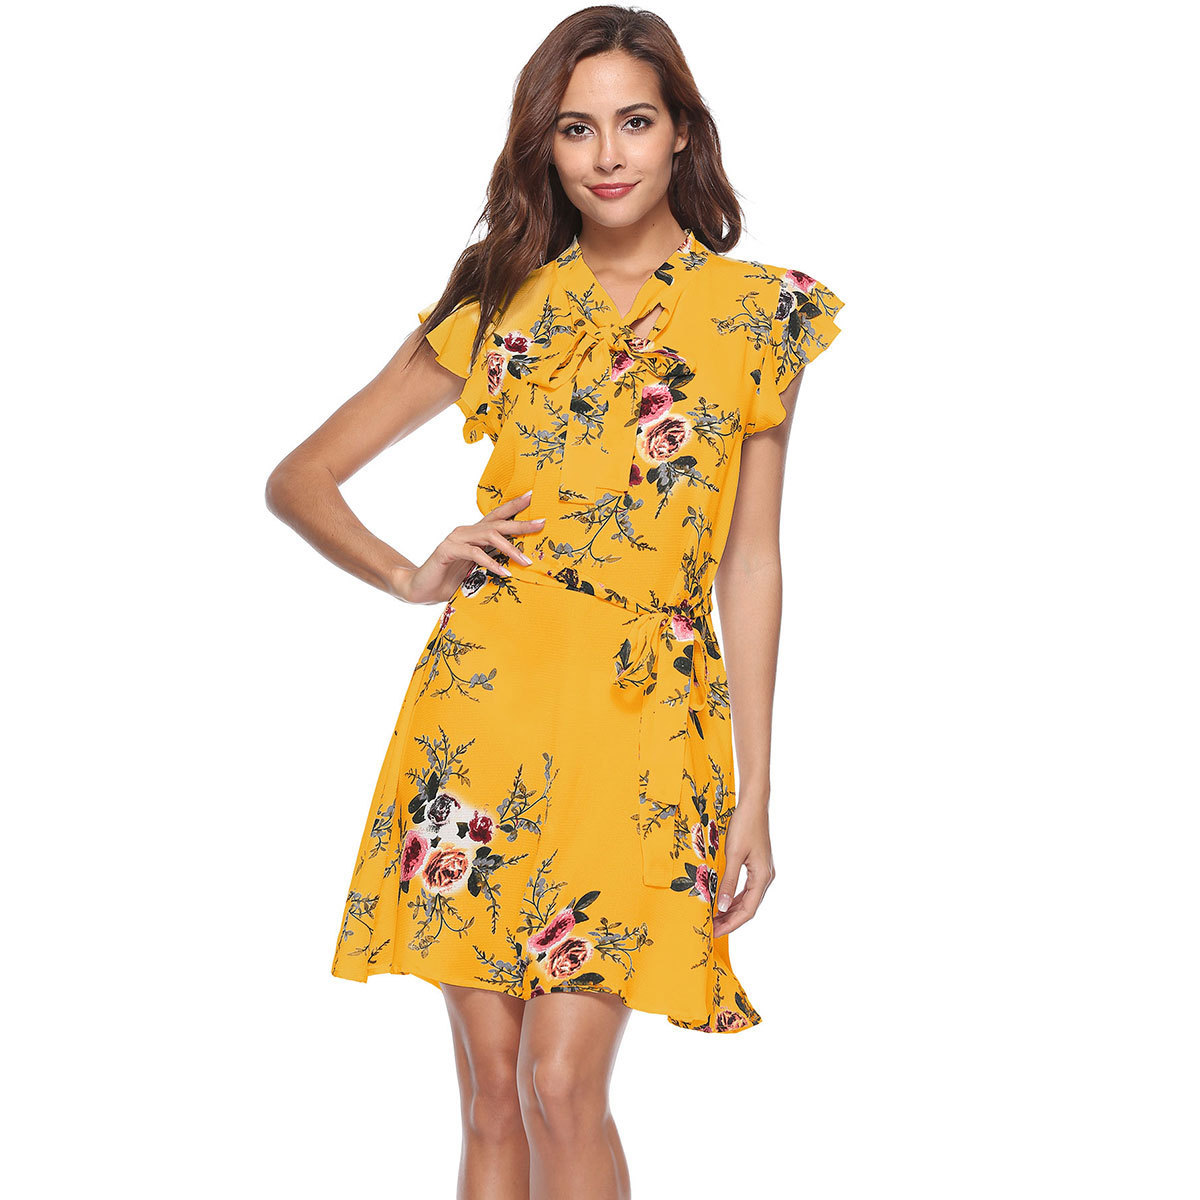 d95b0c54c1e Yellow Floral Short Sleeve Dress - Gomes Weine AG